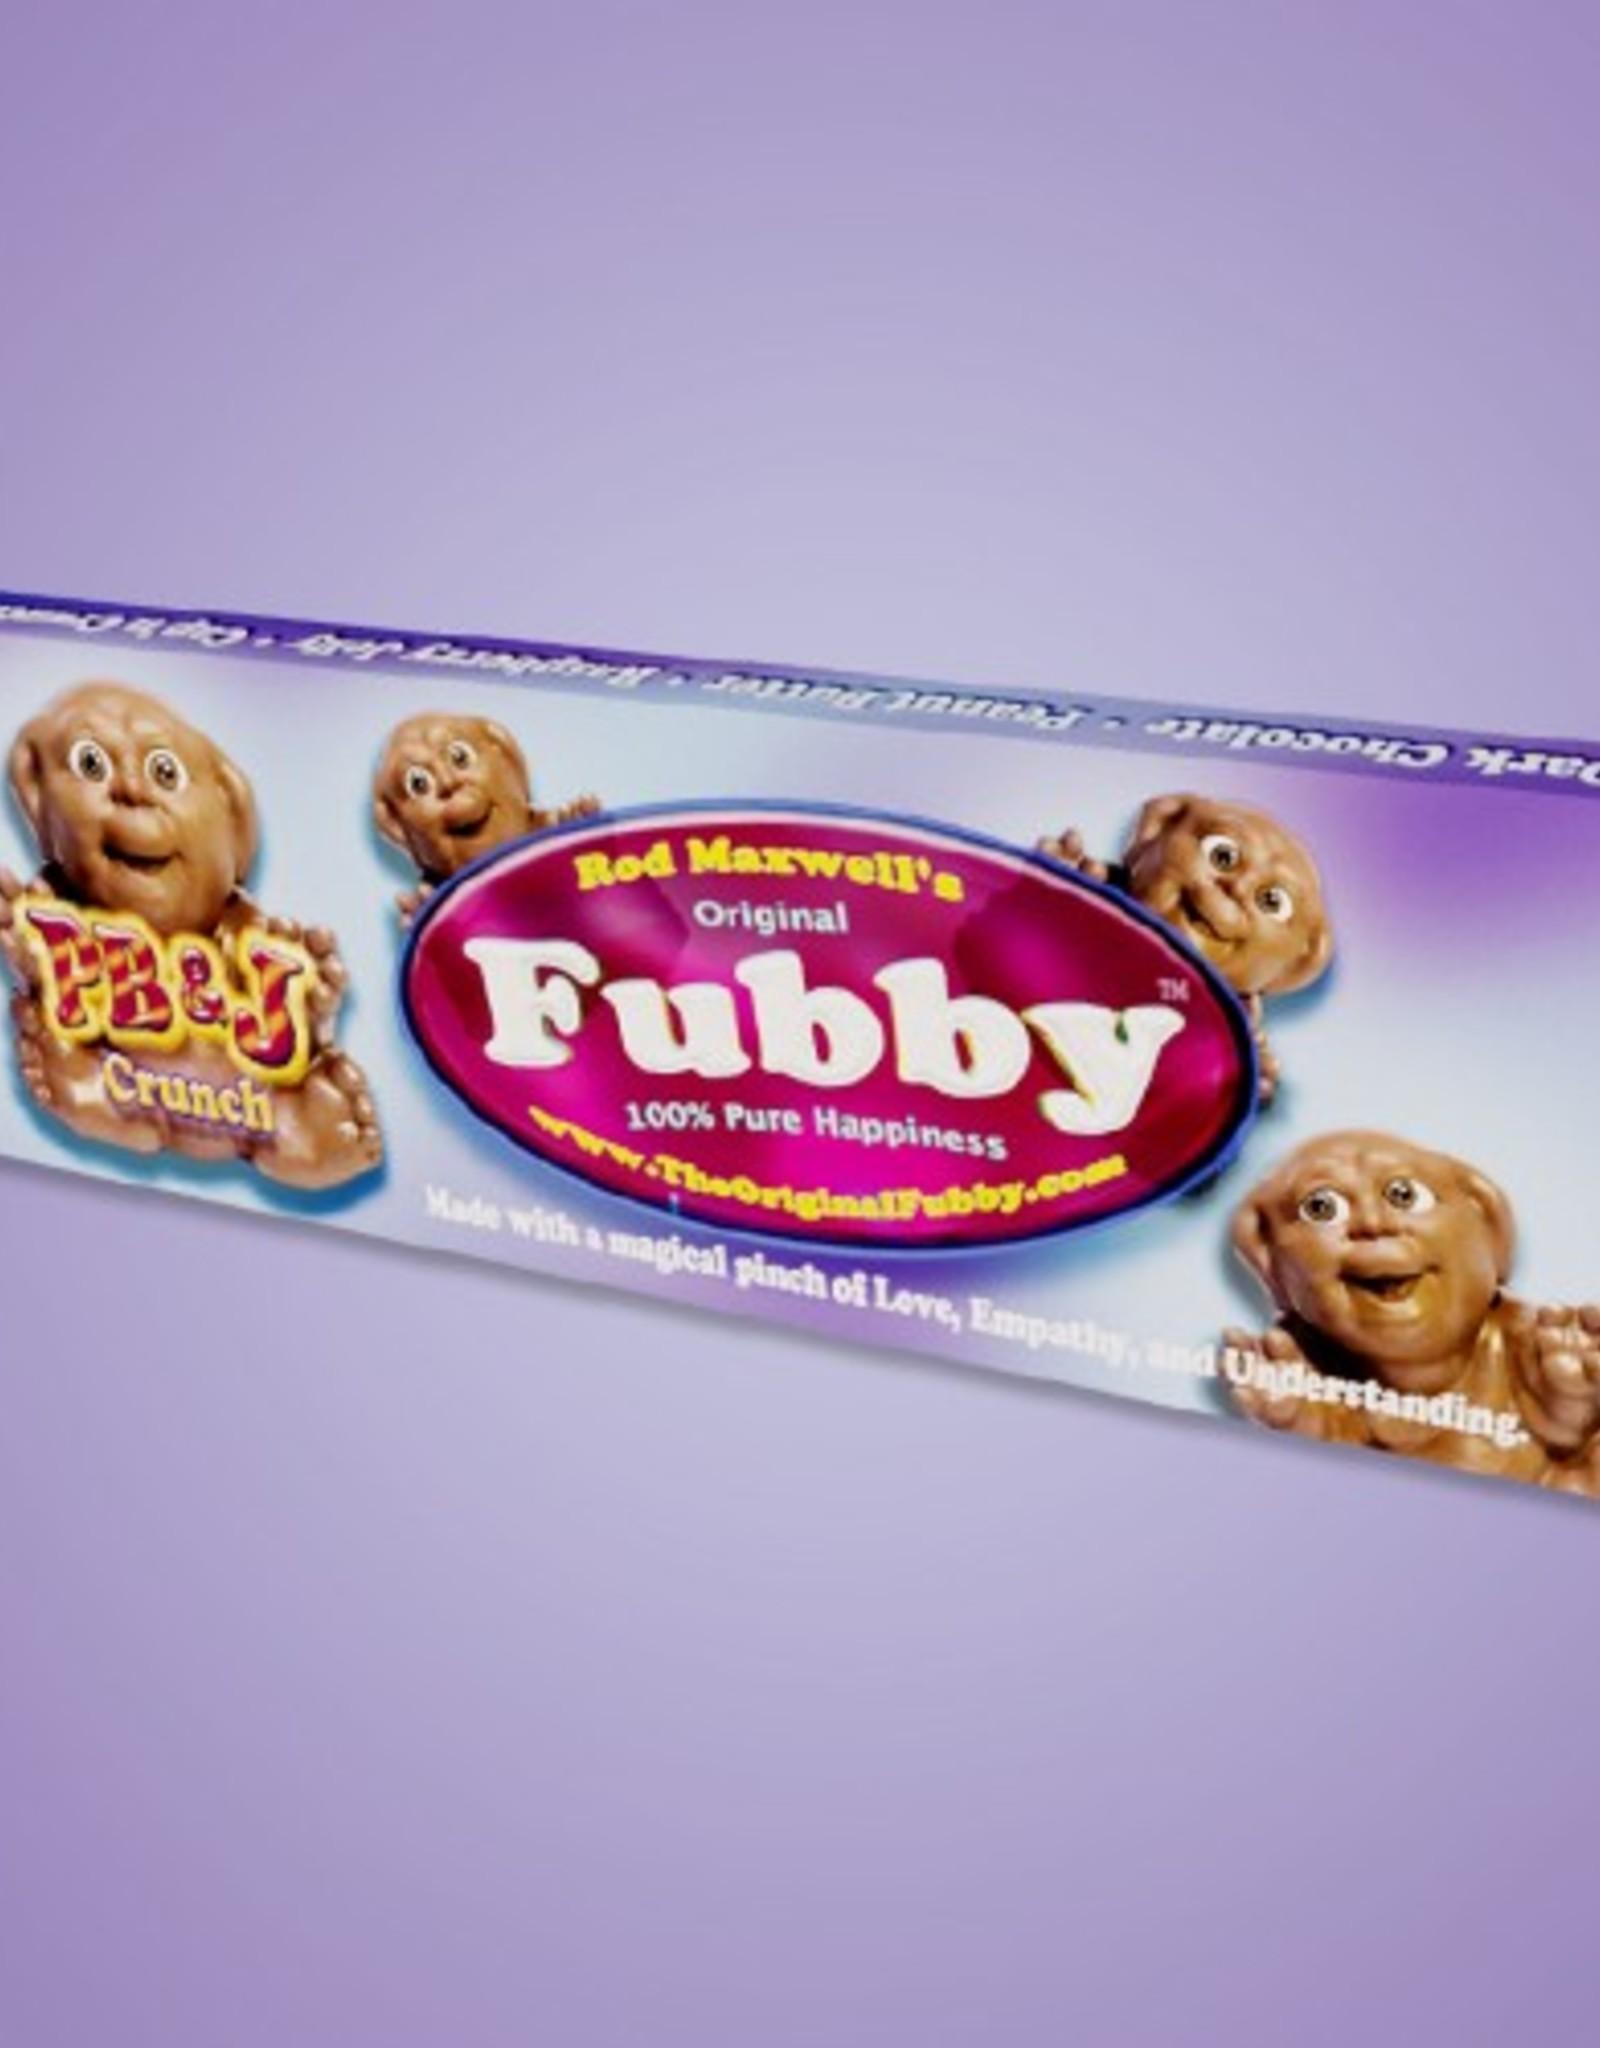 Rod Maxwell's Fubby Bar - Dark Chocolate, Peanut Butter, Raspberry jelly, Cap'n Crunch